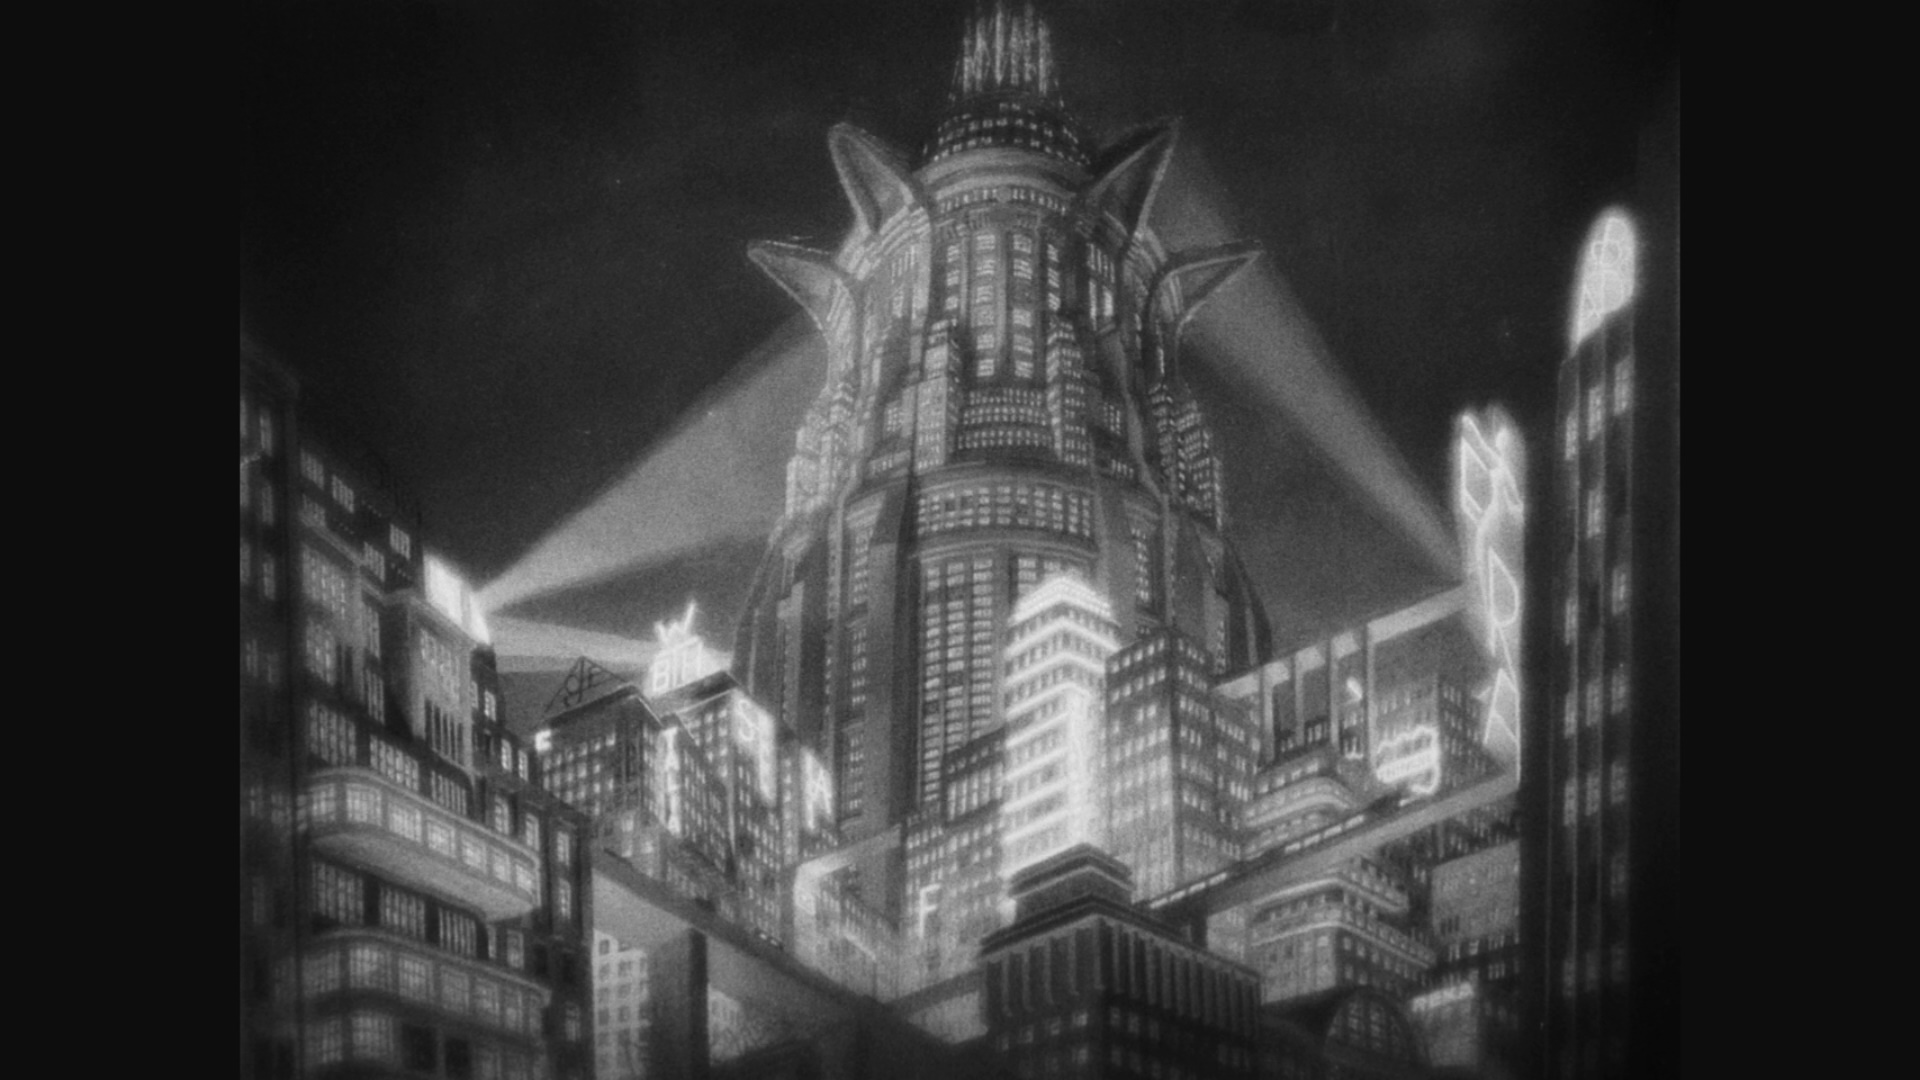 https://i2.wp.com/www.dvdbeaver.com/film3/blu-ray_reviews52/metropolis_blu-ray_/large2/large_metropolis_MoC_blu-ray_met.jpg